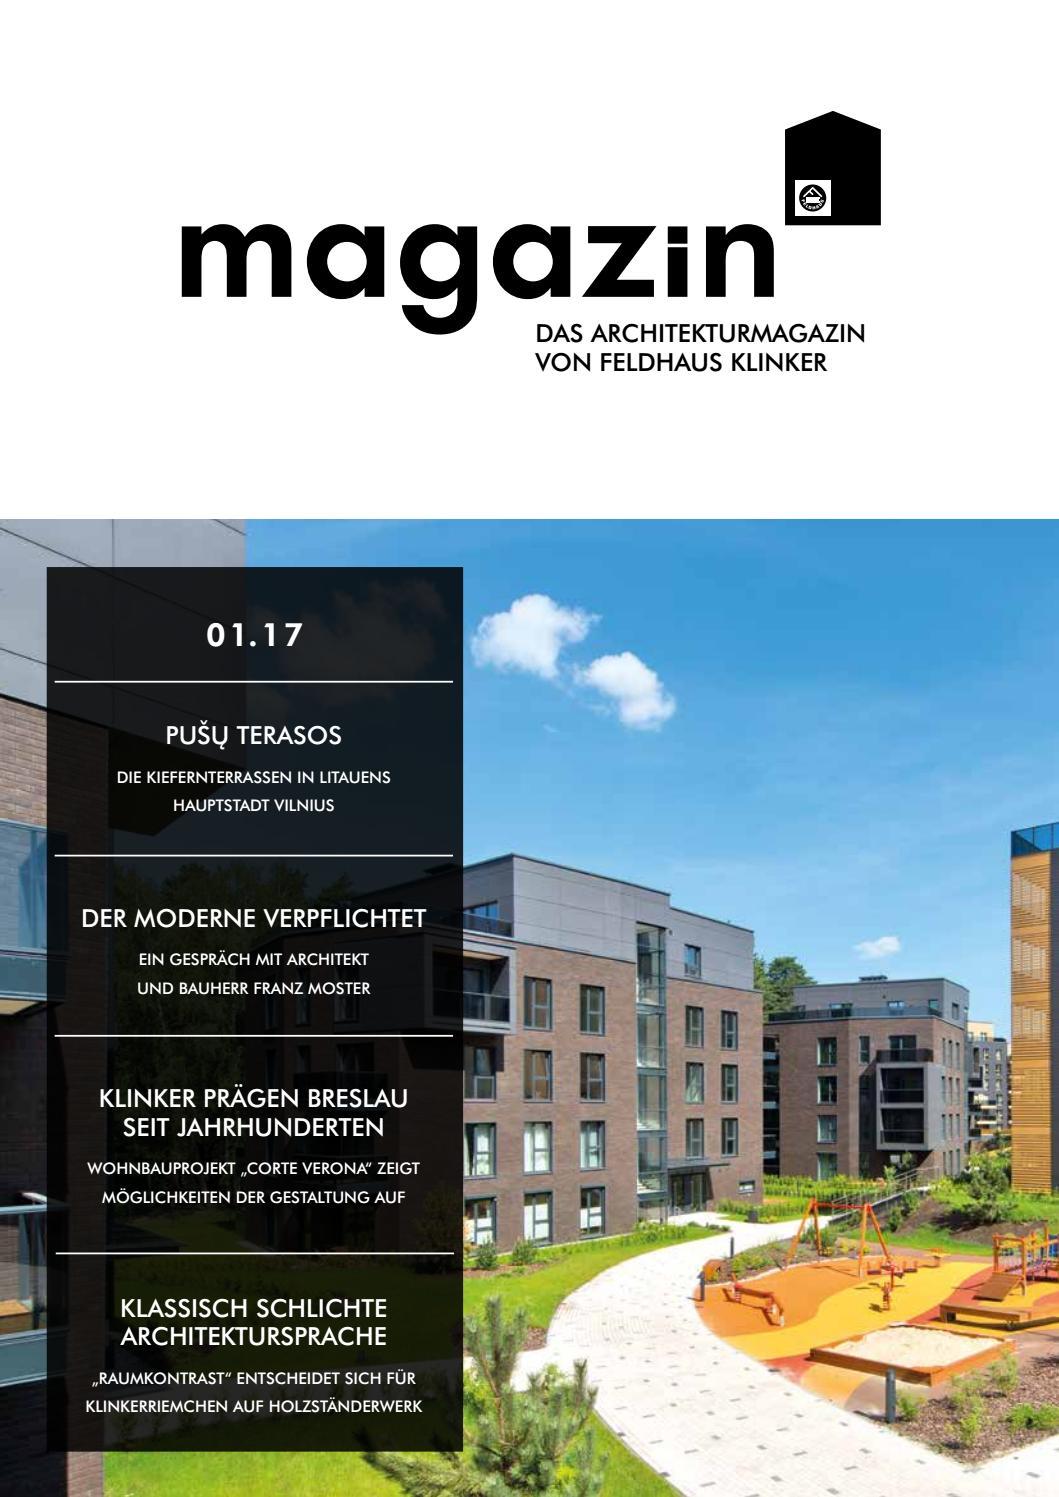 FELDHAUS KLINKER magazin by FELDHAUS KLINKER VERTRIEBS GMBH - issuu